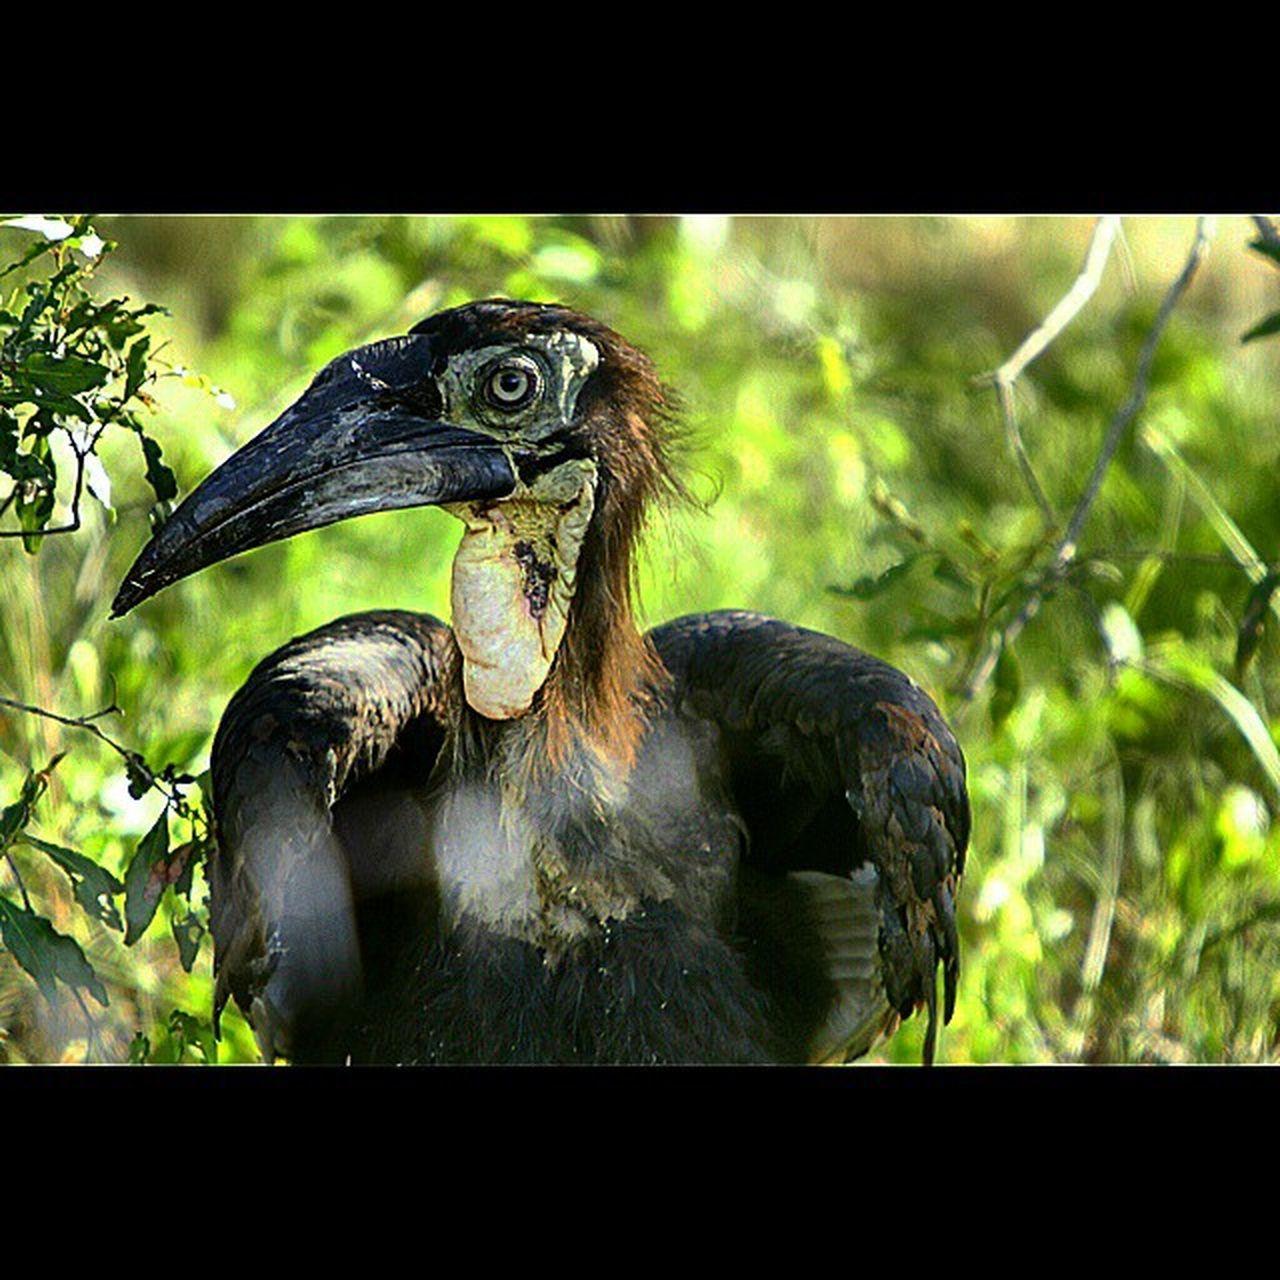 Southern Ground Hornbill, a Female... Hornbill Savethehornbill Krugernationalpark Southafrica